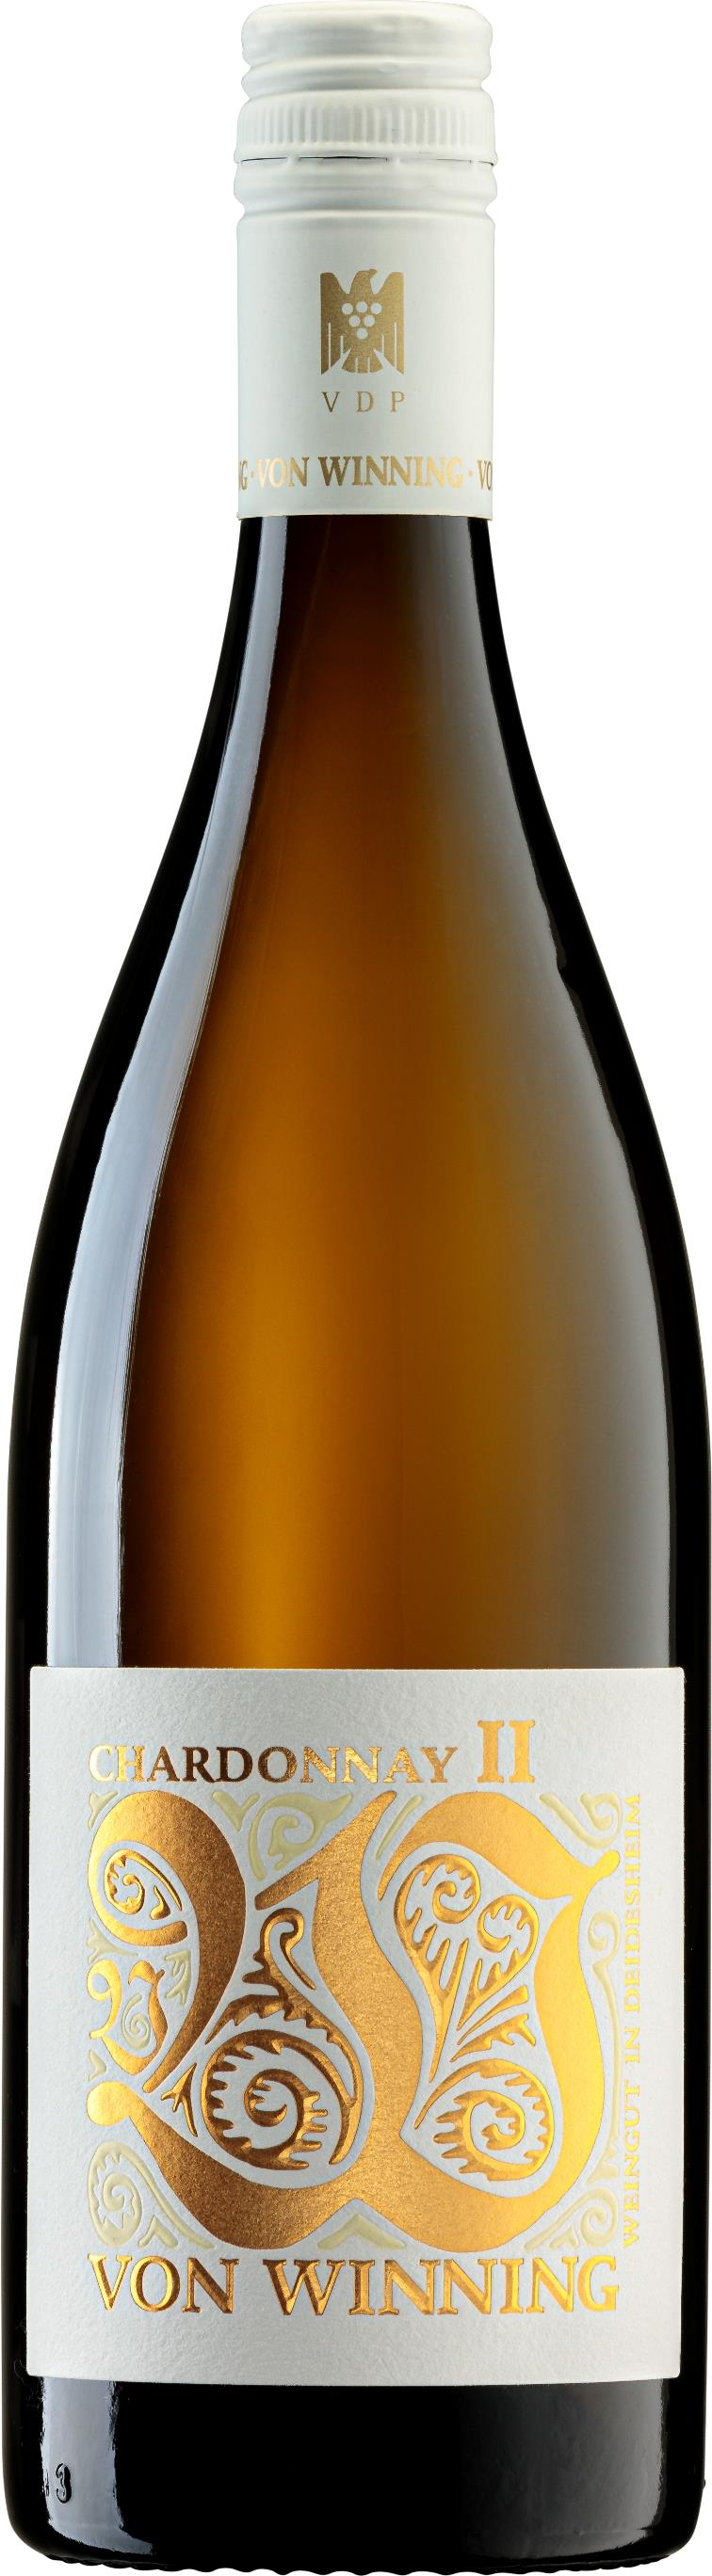 2018 Chardonnay II VDP.GUTSWEIN